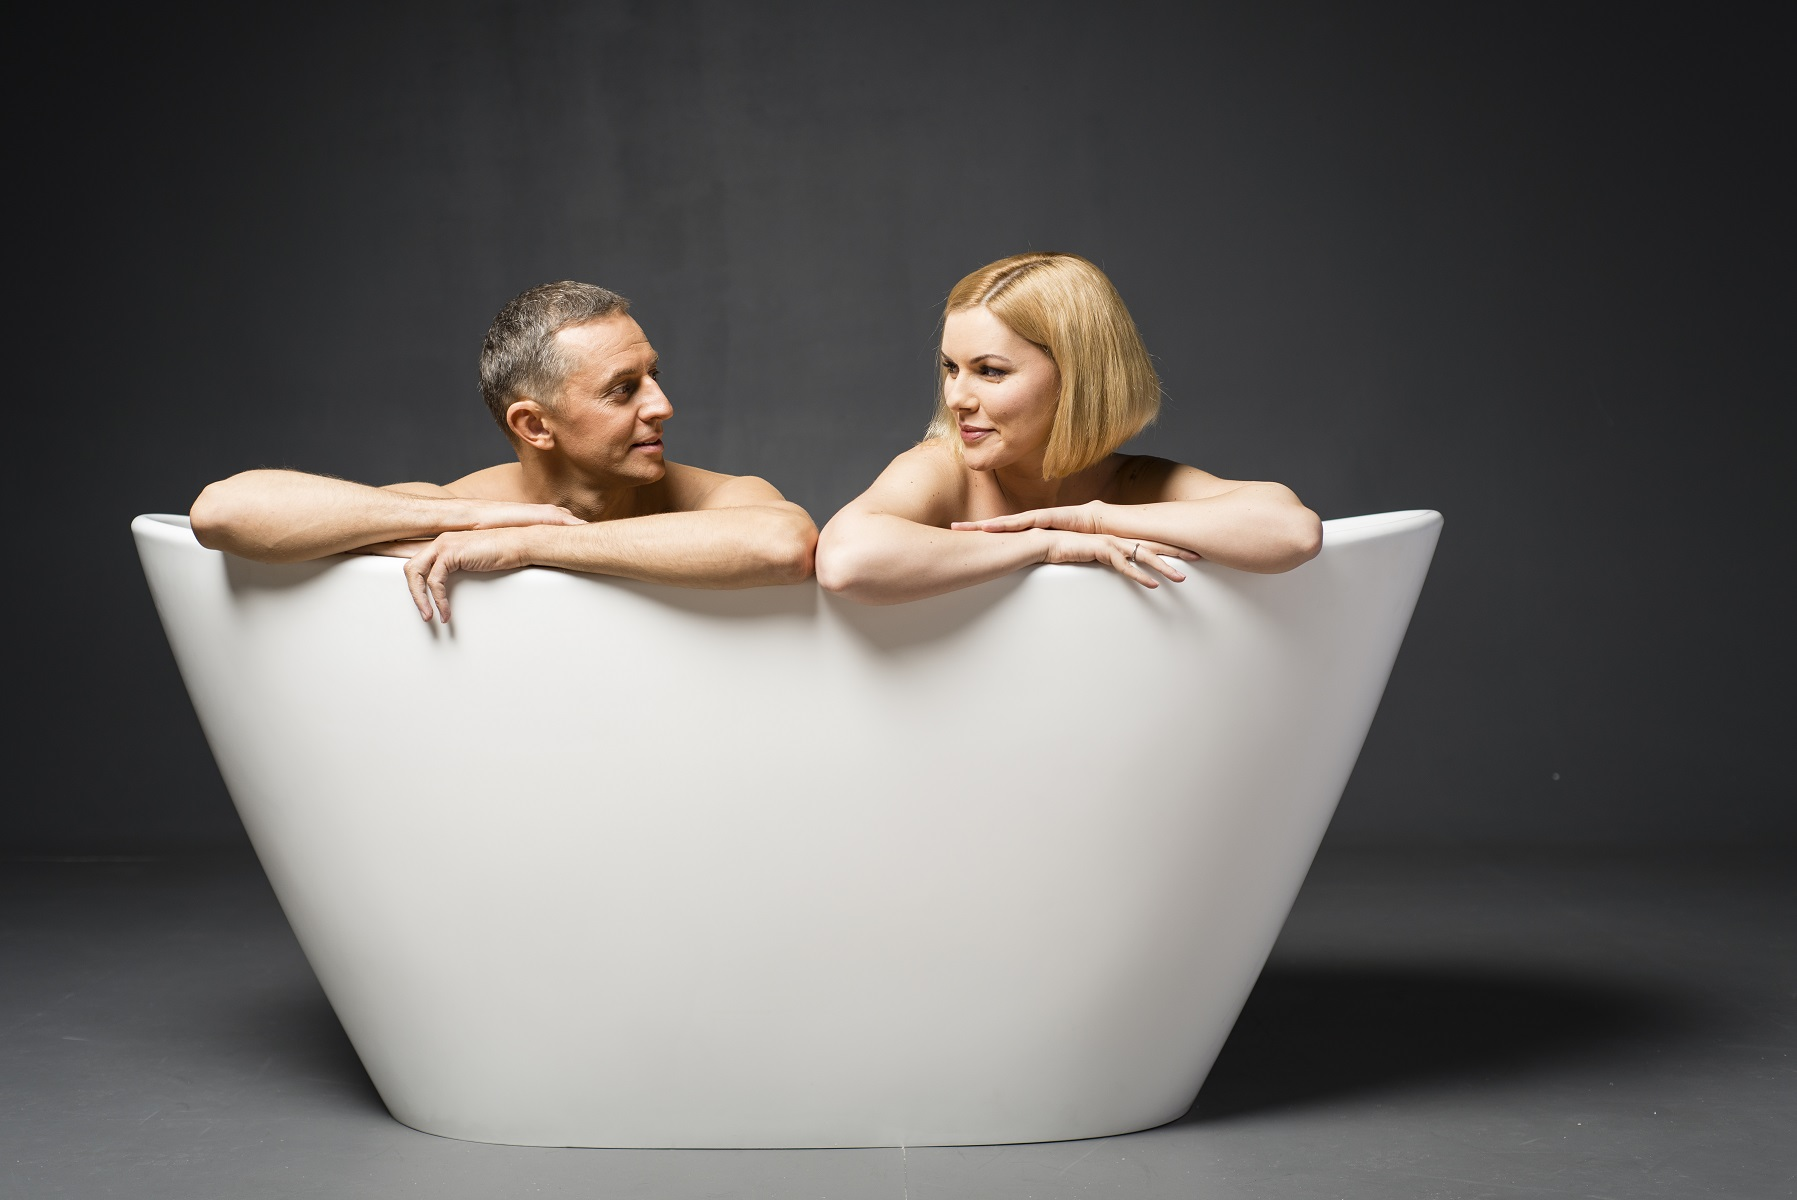 Pretty Person In Bathtub Ideas - The Best Bathroom Ideas - lapoup.com